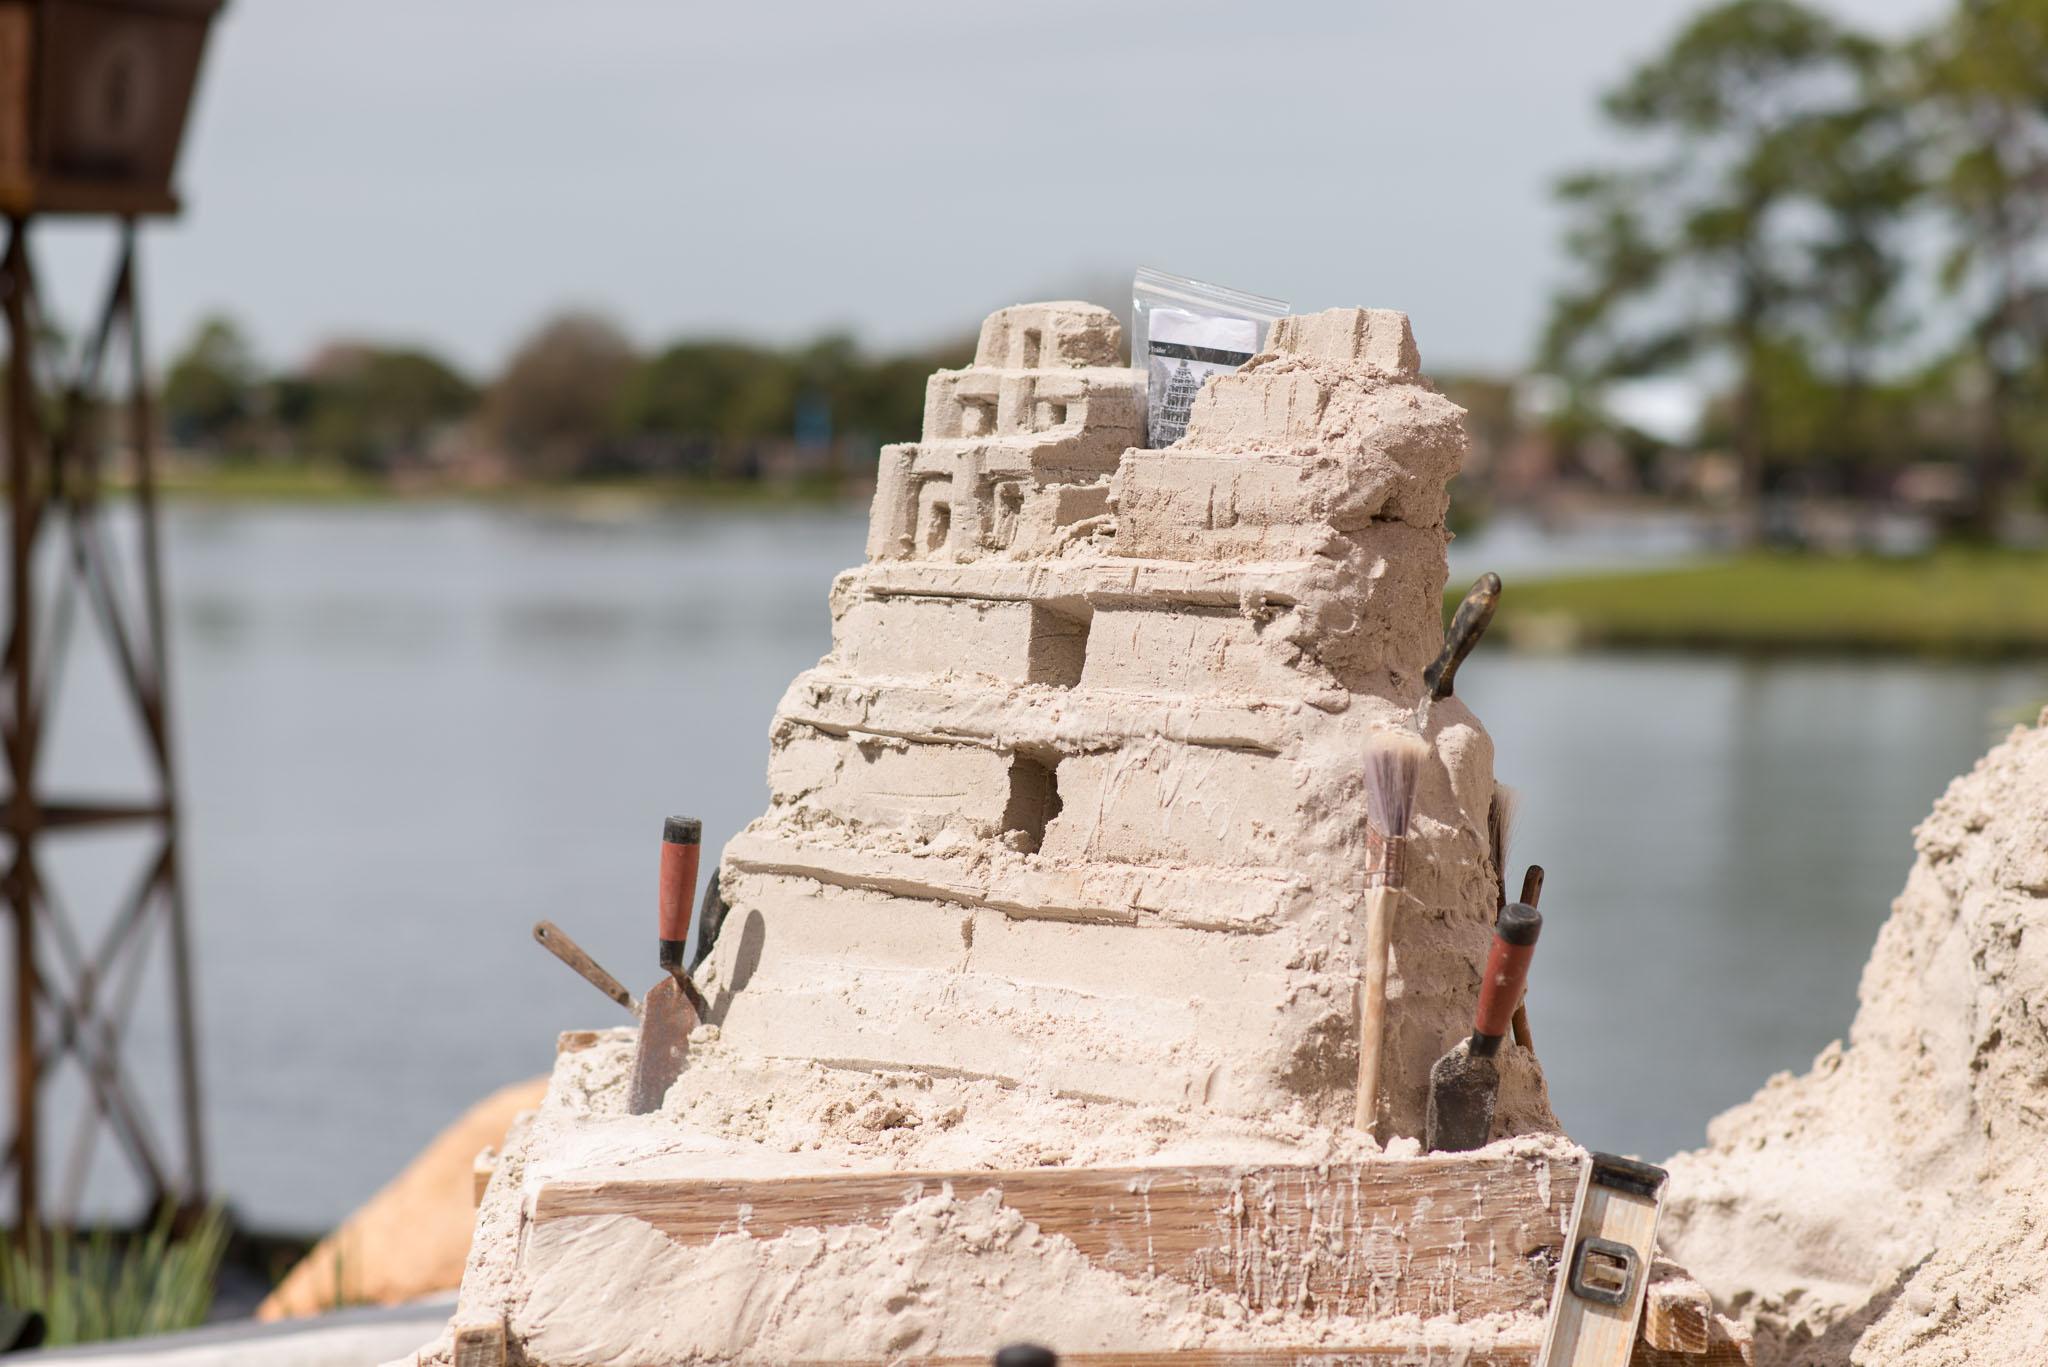 Sand Sculpture Pyramid - Epcot Flower & Garden Festival 2016